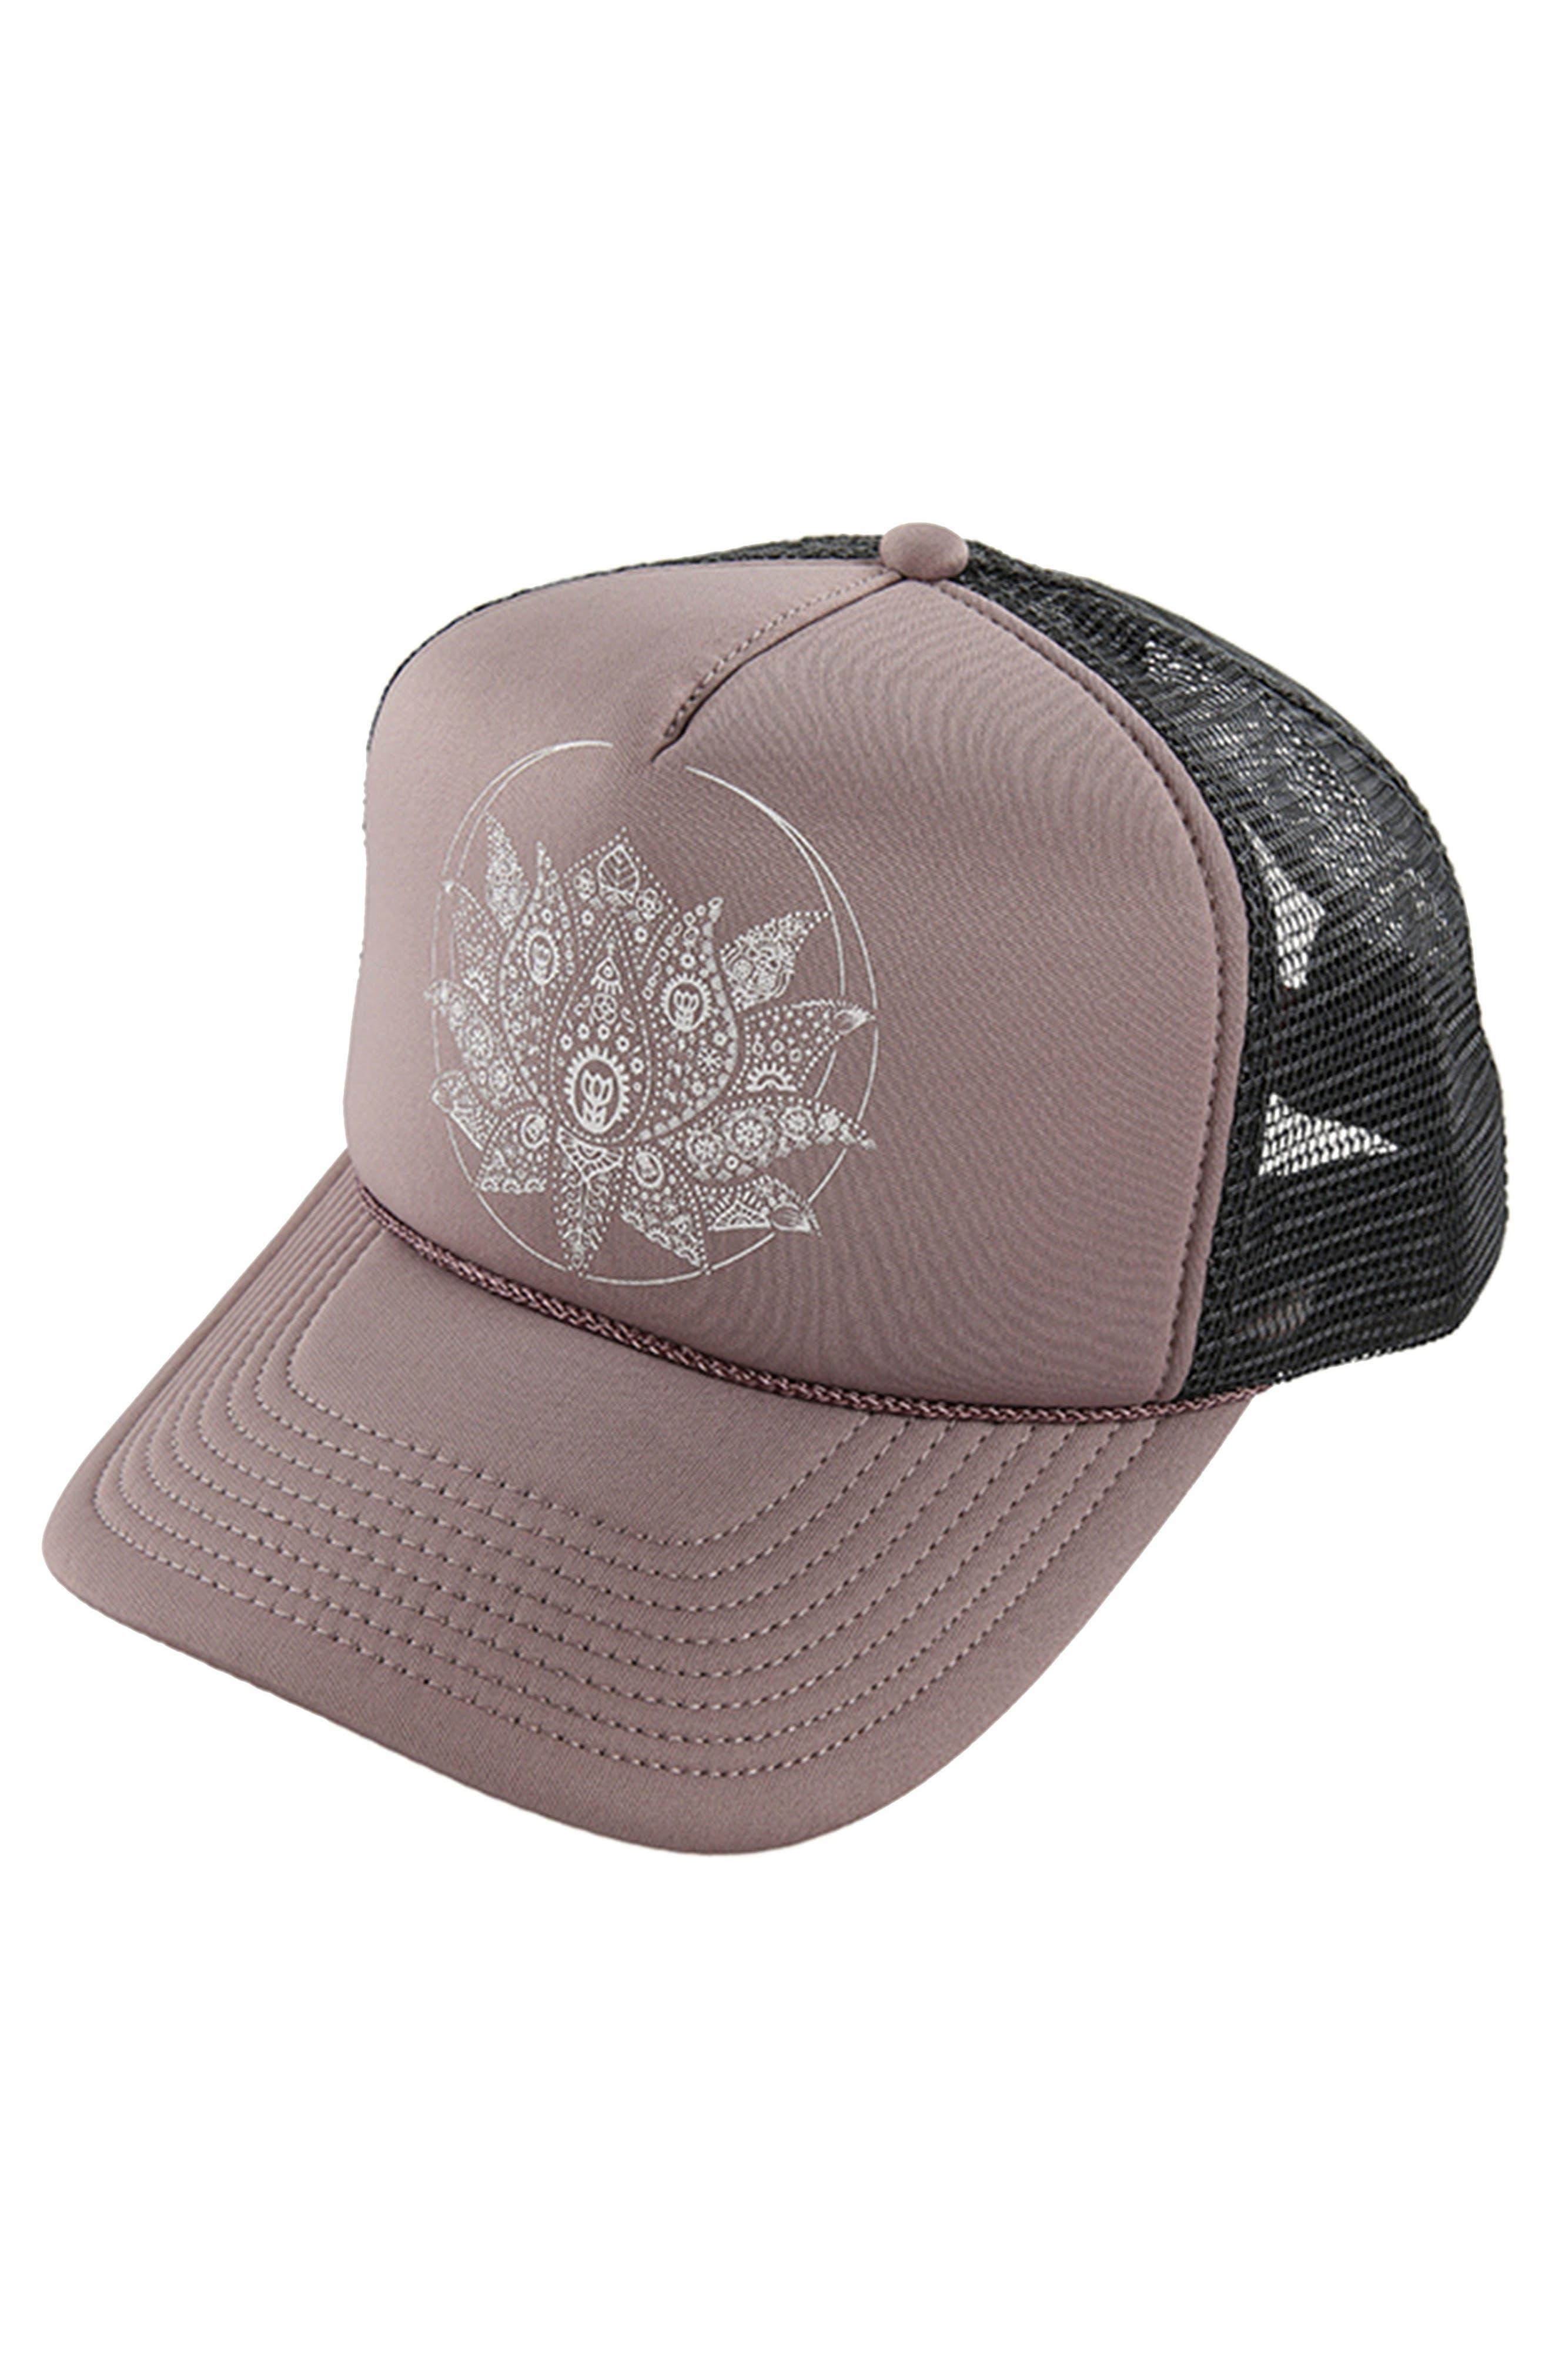 Zen Life Aloha Trucker Hat,                         Main,                         color,